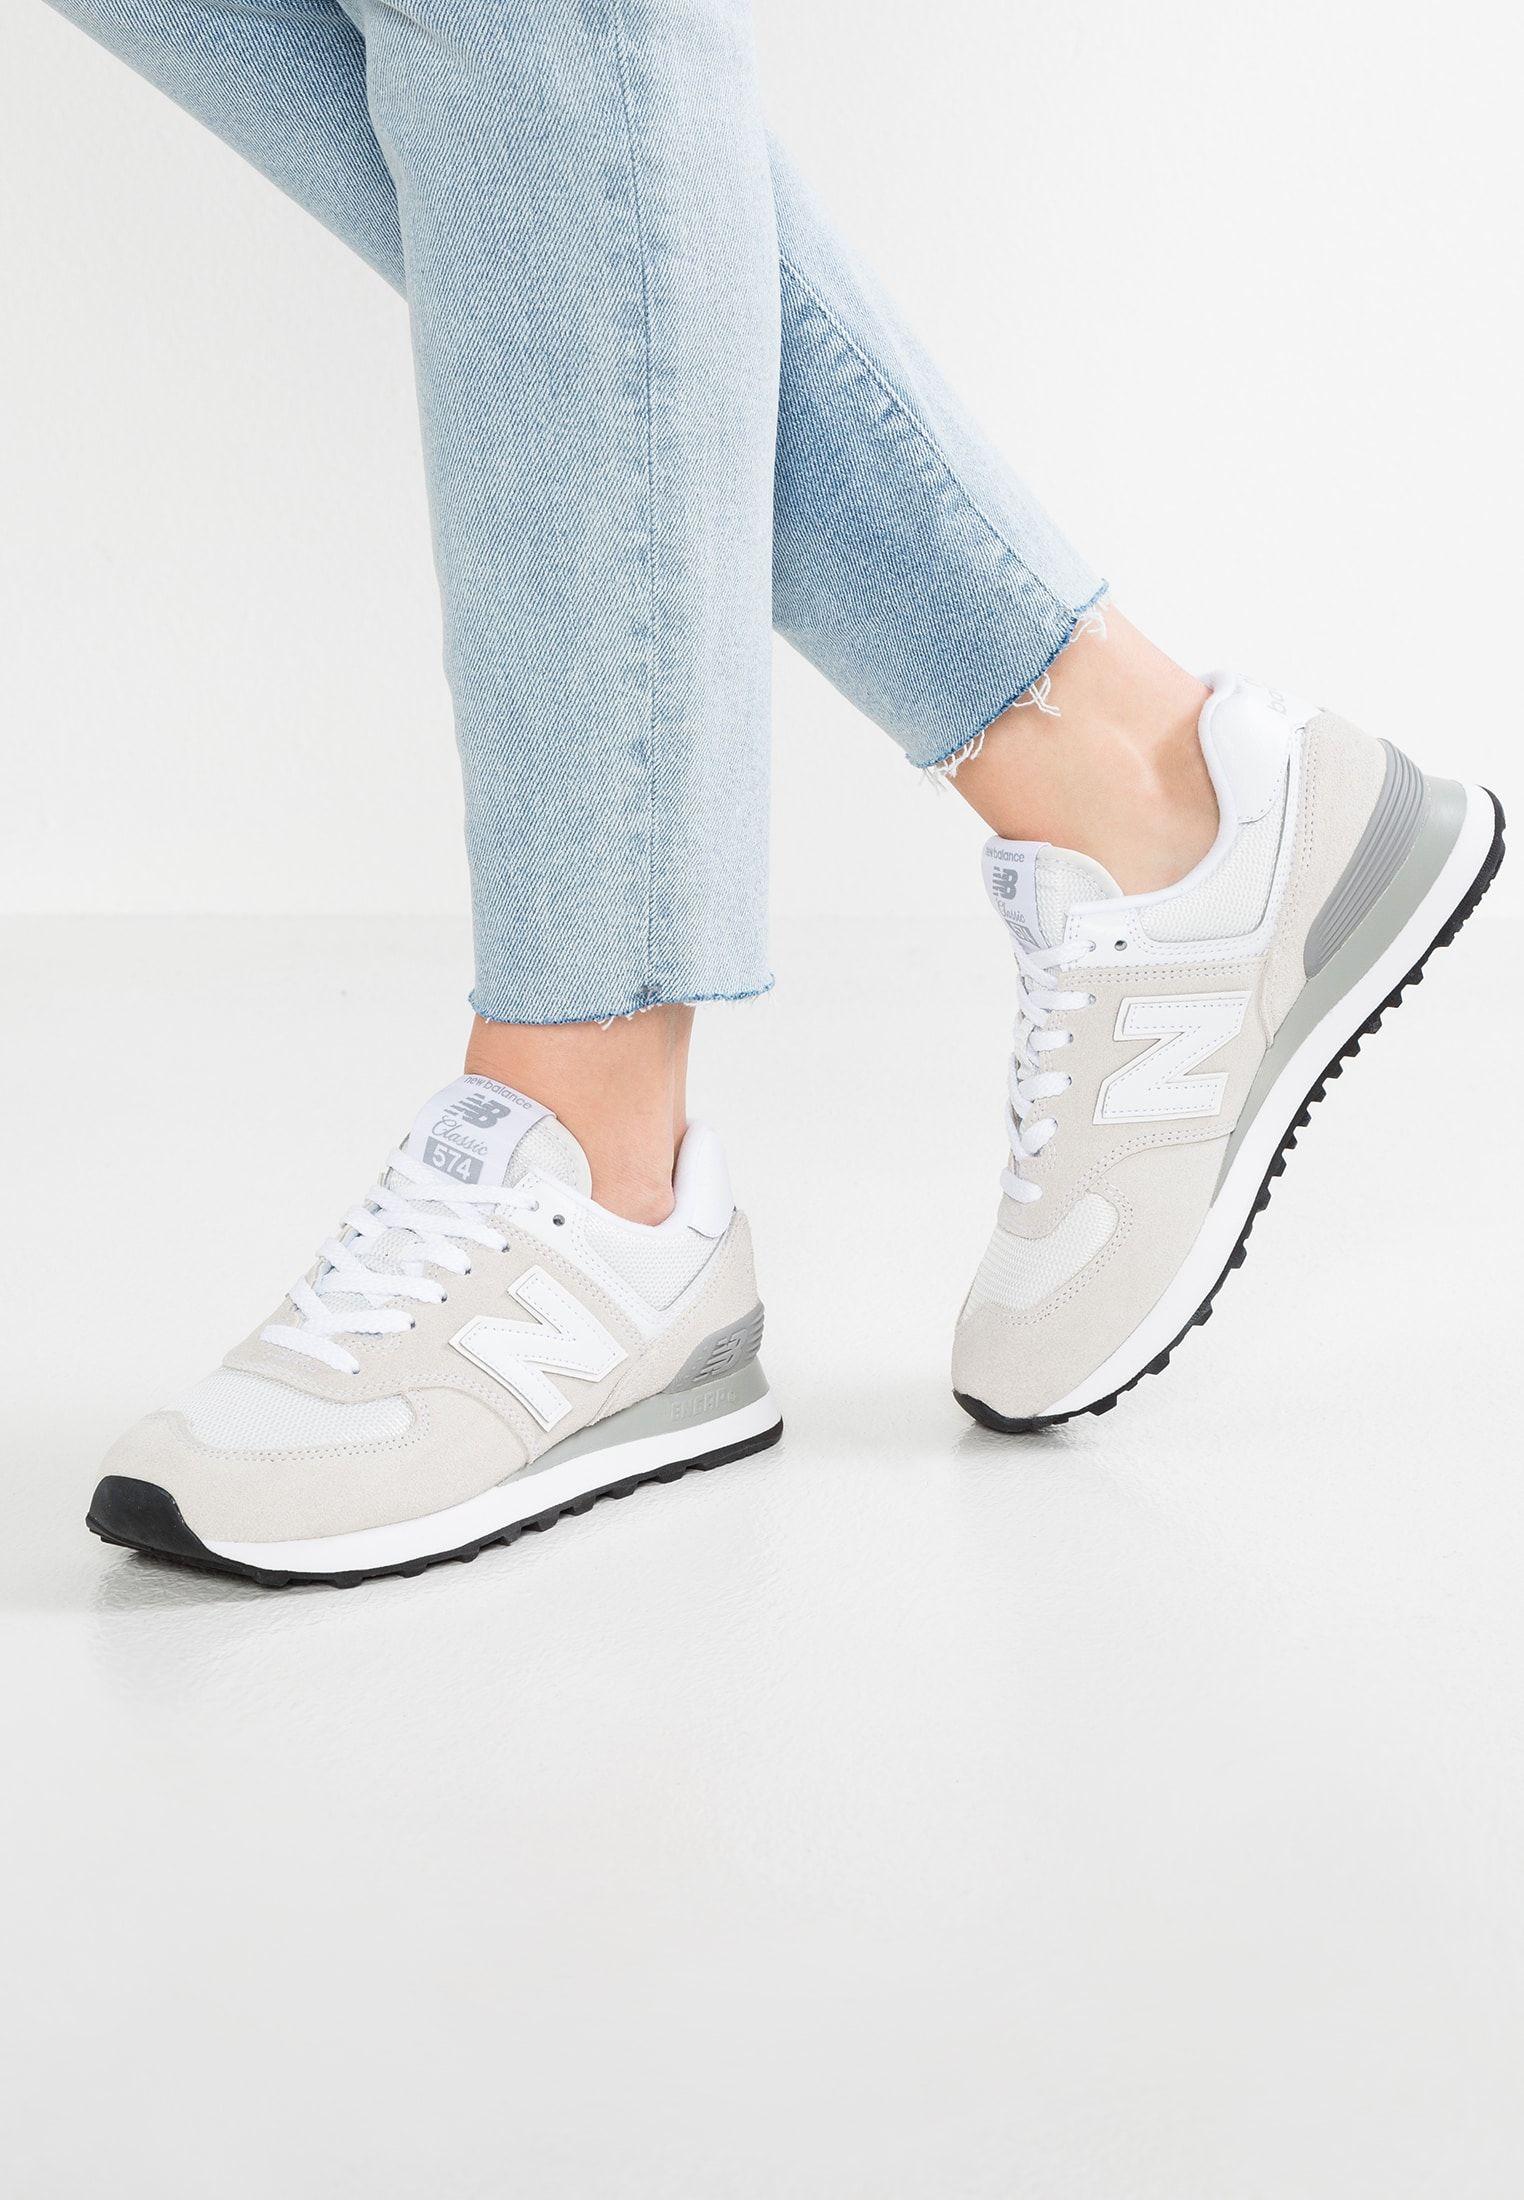 donna scarpe ginnastica new balance